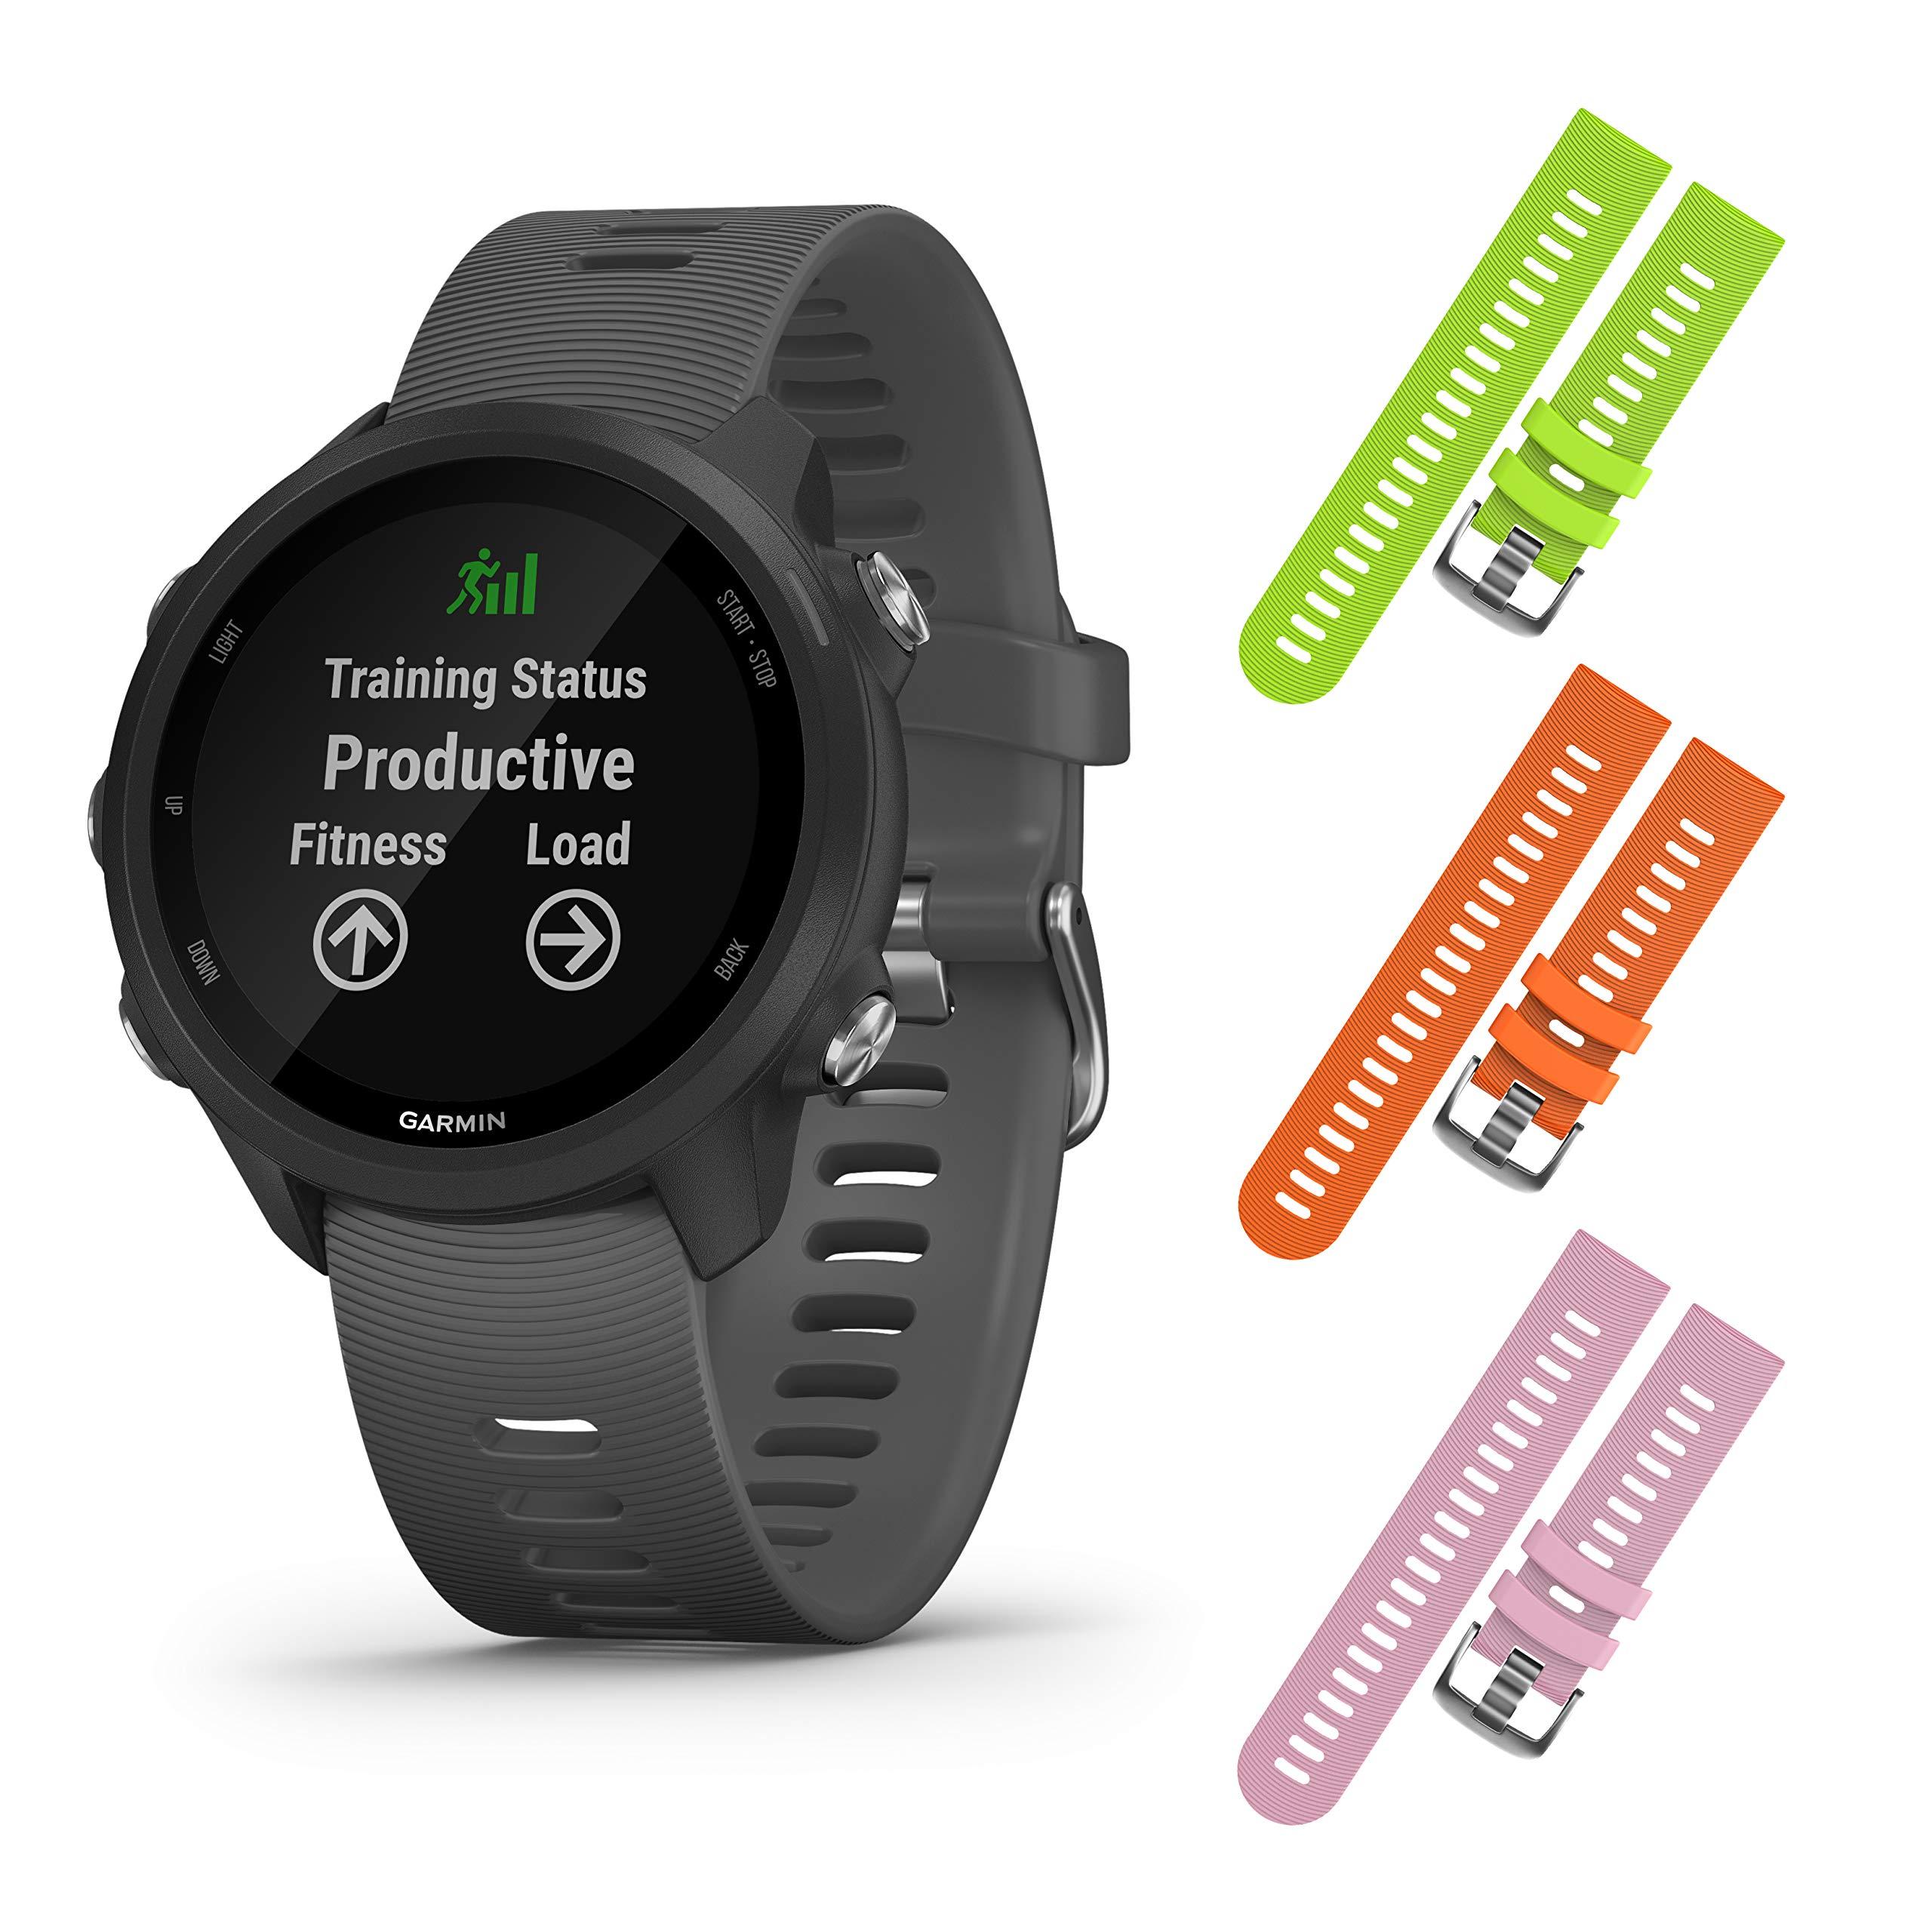 Garmin Forerunner 245 GPS Running Smartwatch with Included Wearable4U 3 Straps Bundle (Slate Grey 010-02120-00, Lime/Orange/Pink)